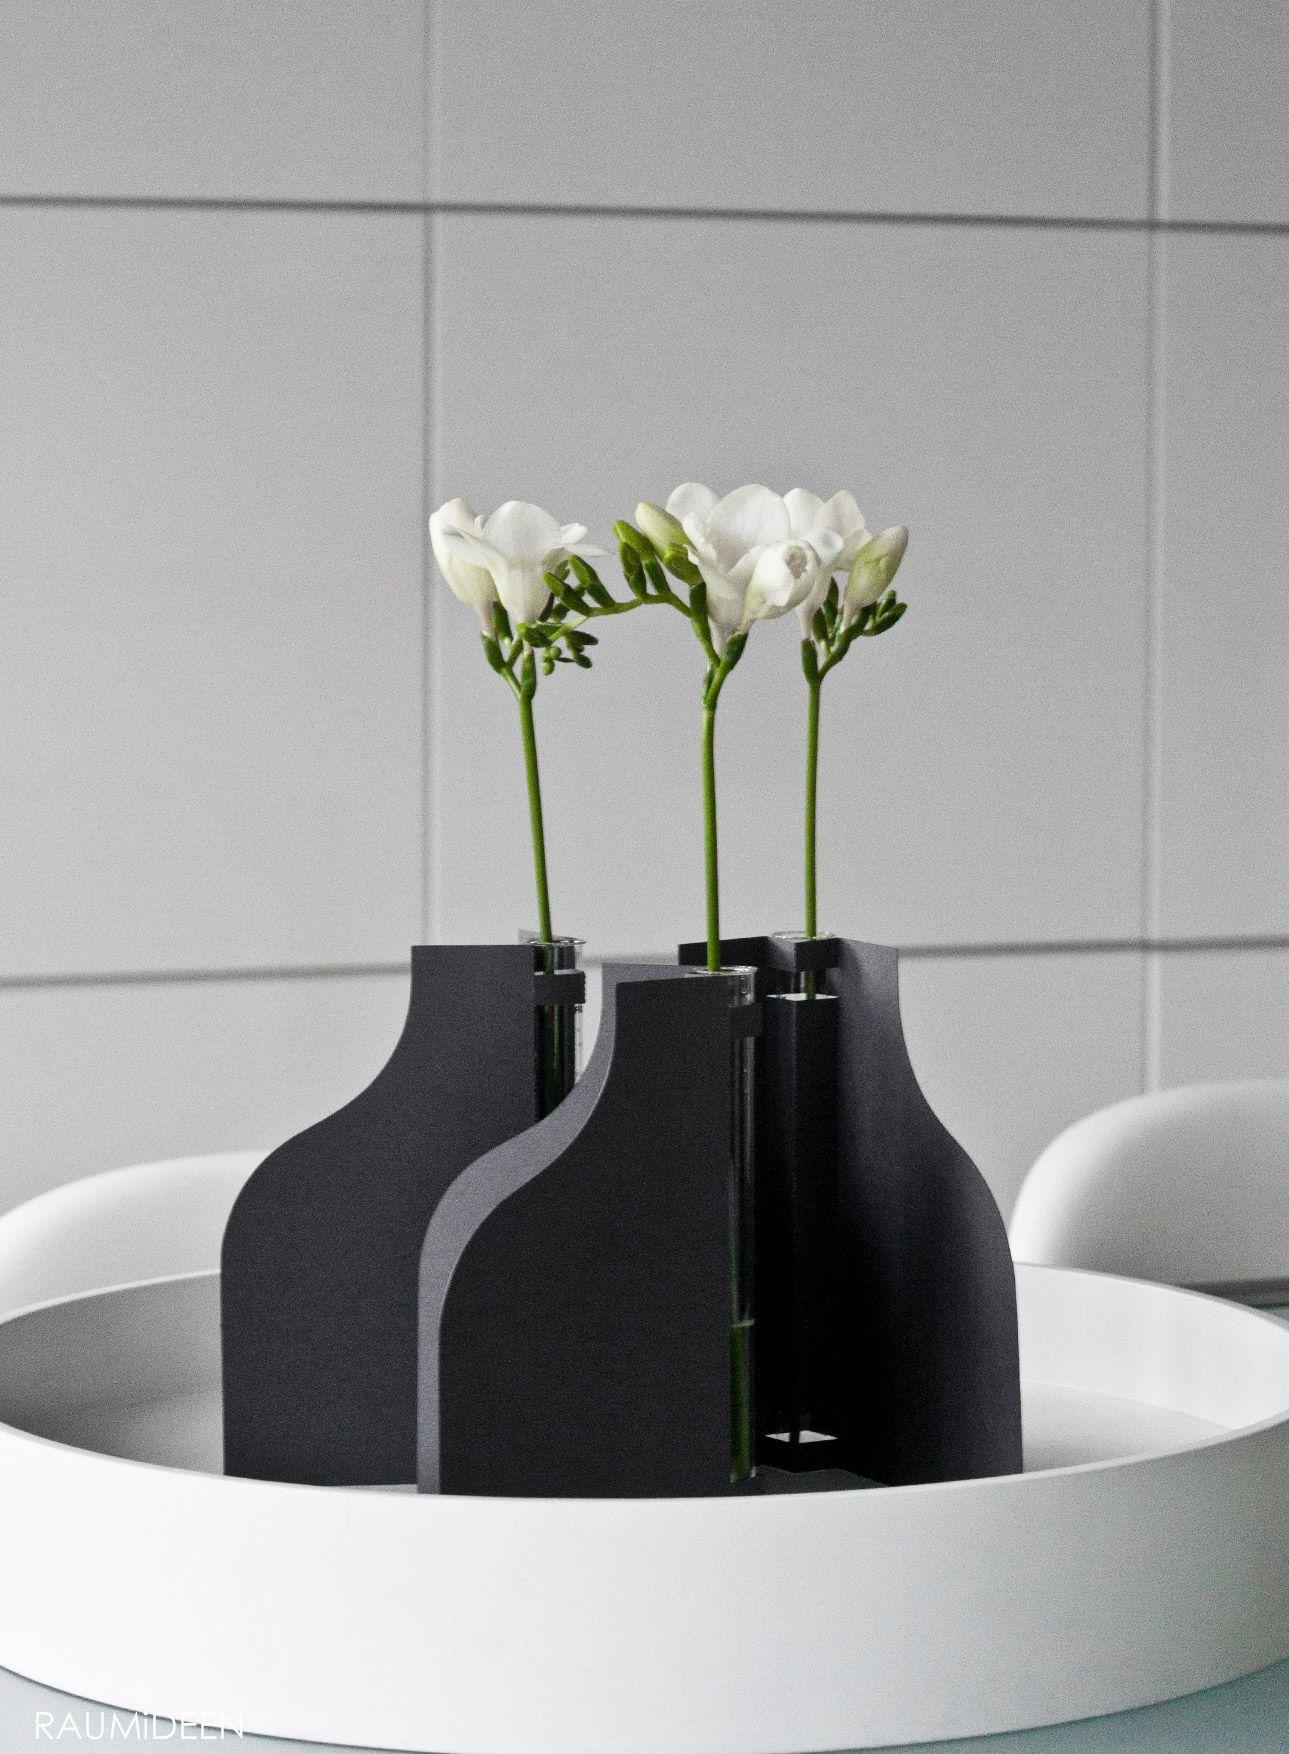 Freesien Blumendekoration Papier Vase